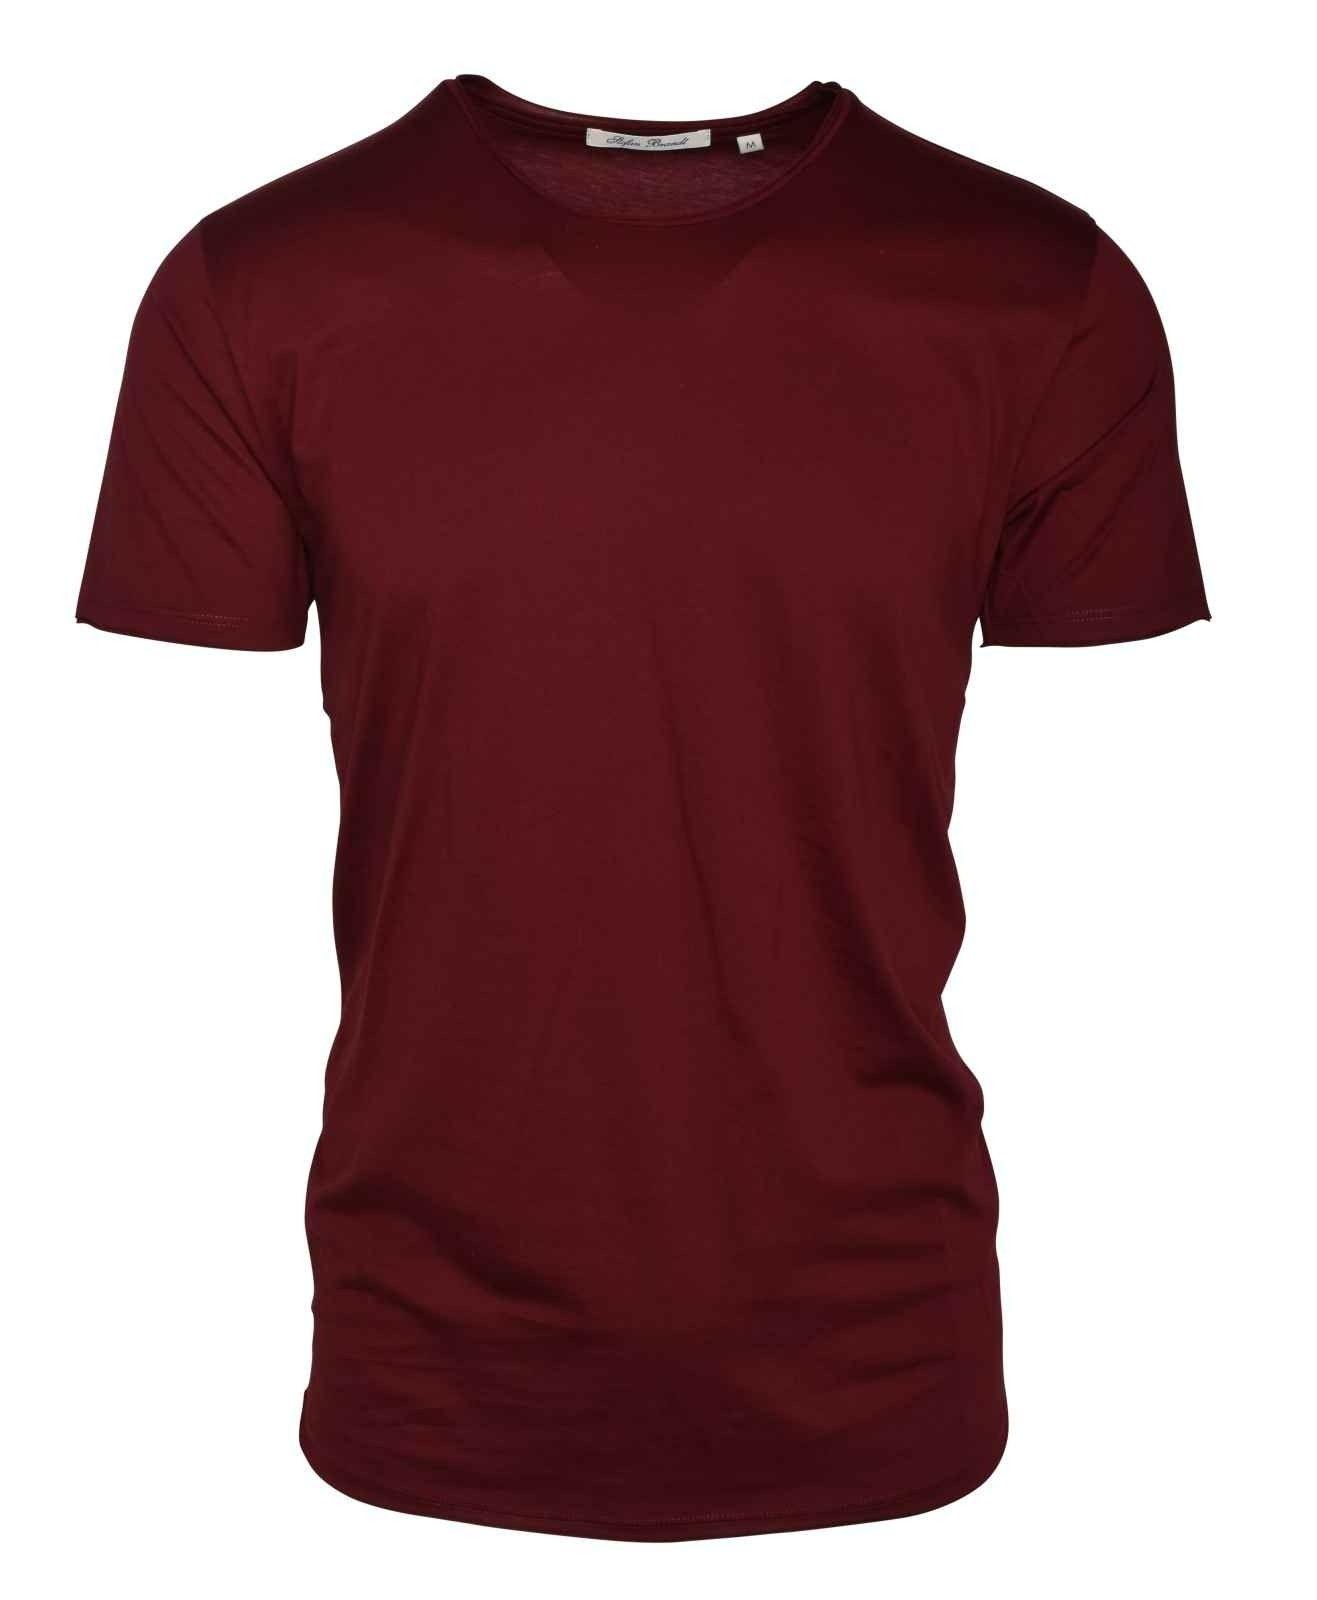 STEFAN BRANDT - Herren T-Shirt - Elia - Chili